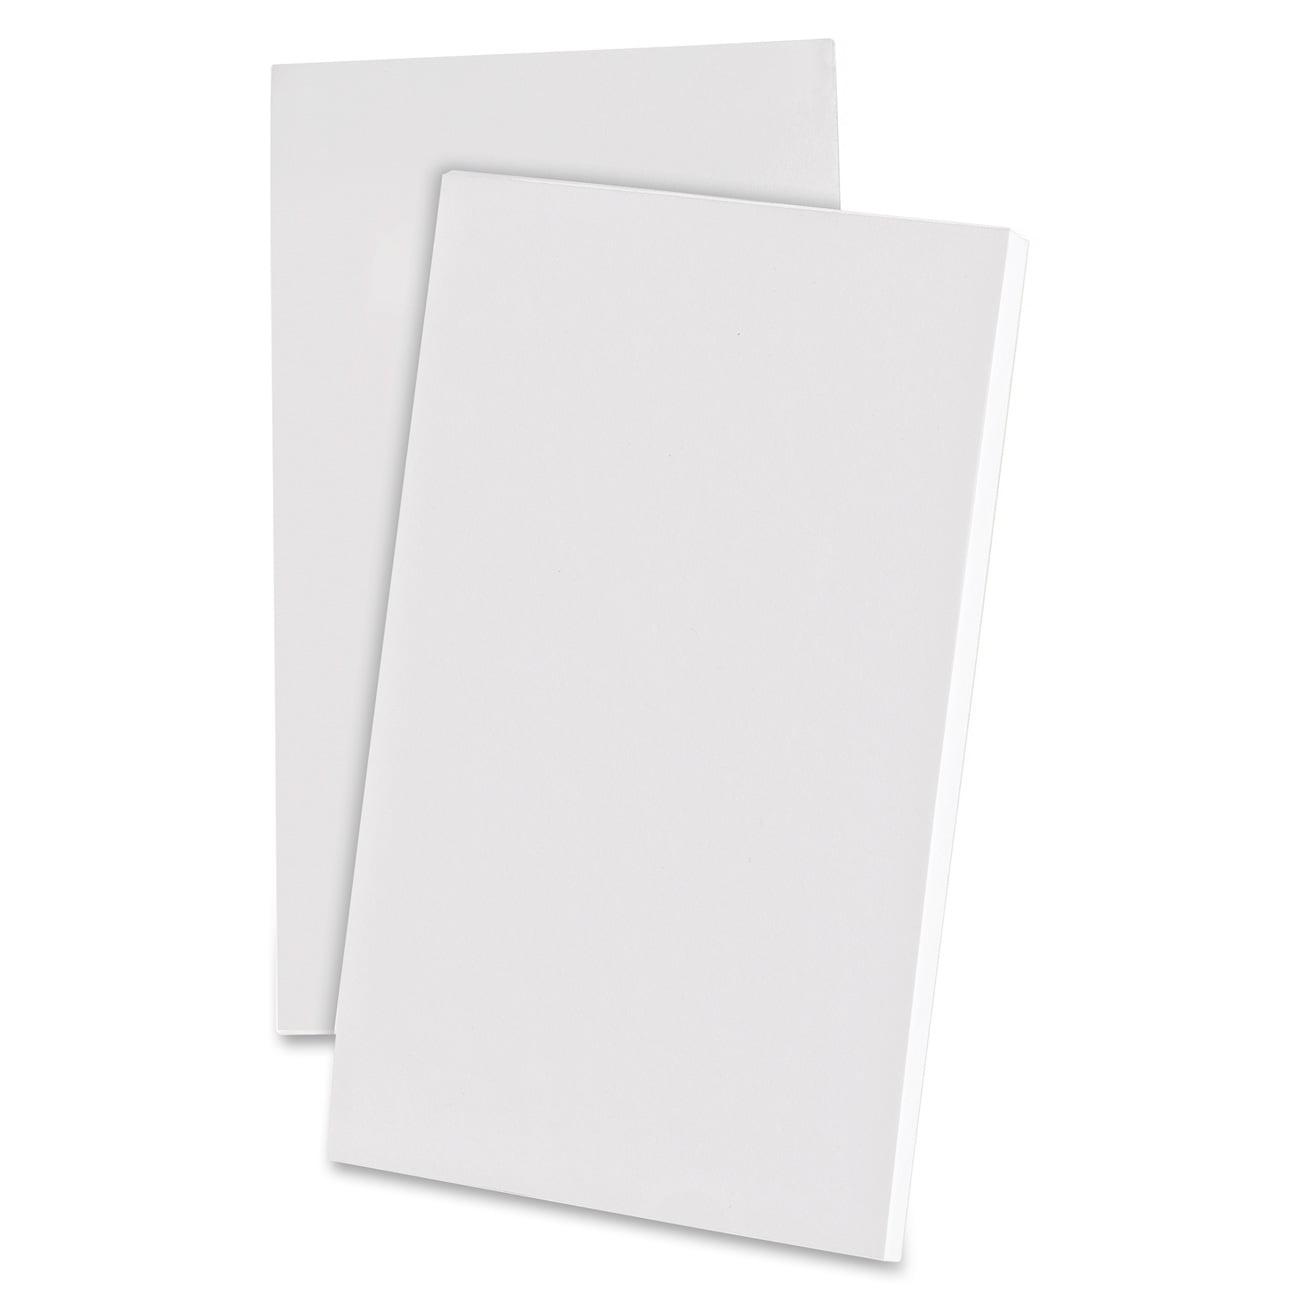 Ampad Scratch Pad Notebook Unruled 3 x 5 White 100 Sheets Dozen 21730